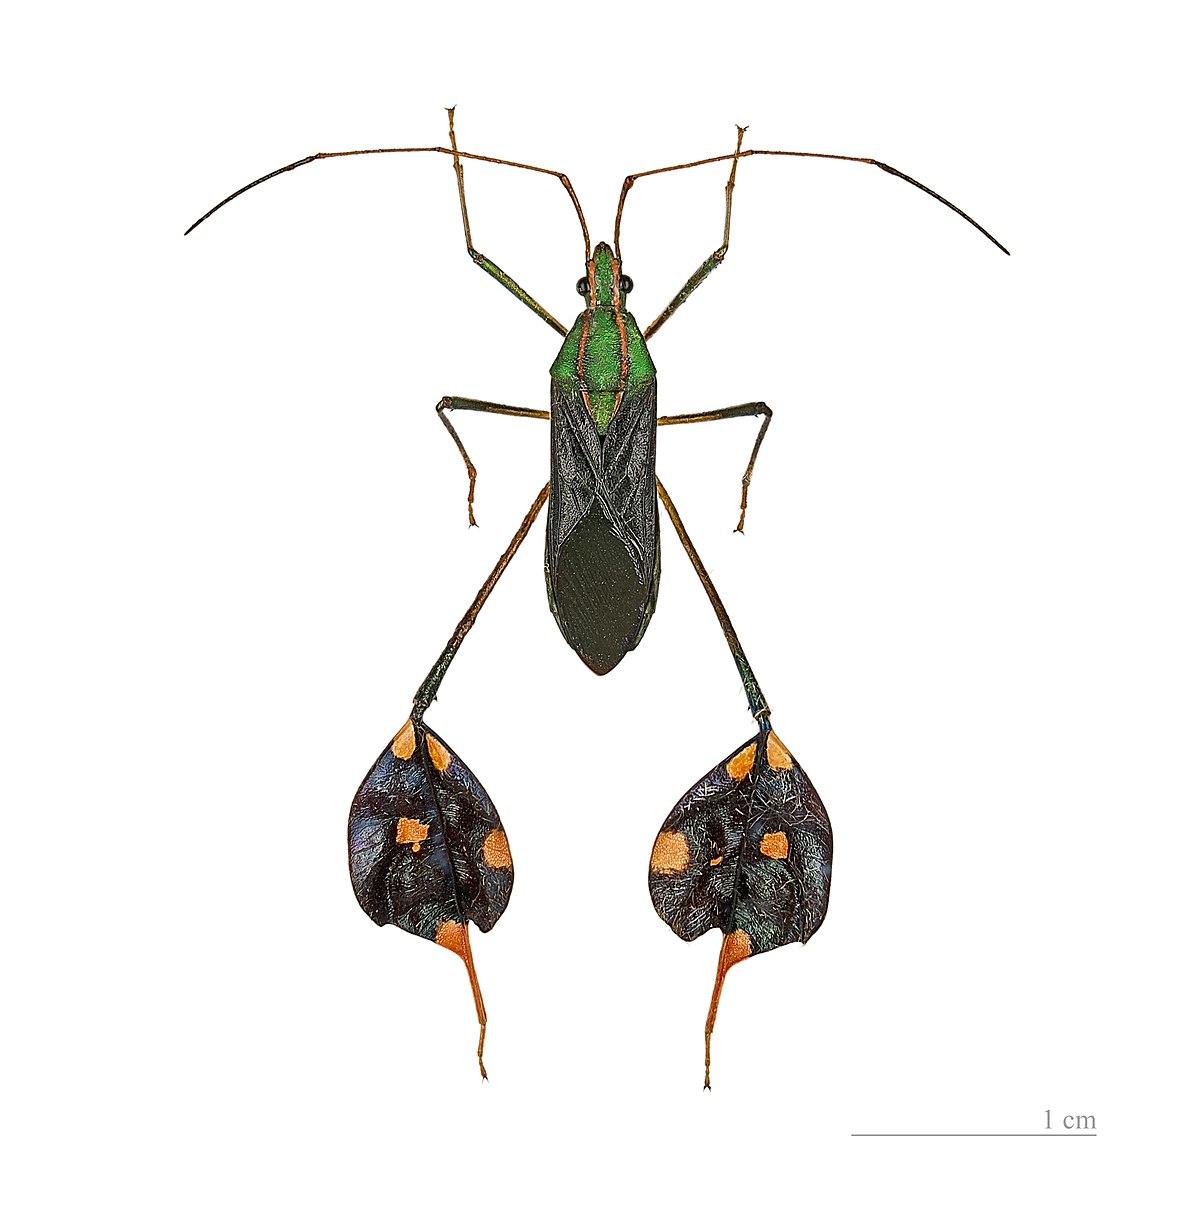 endemică de insecte)